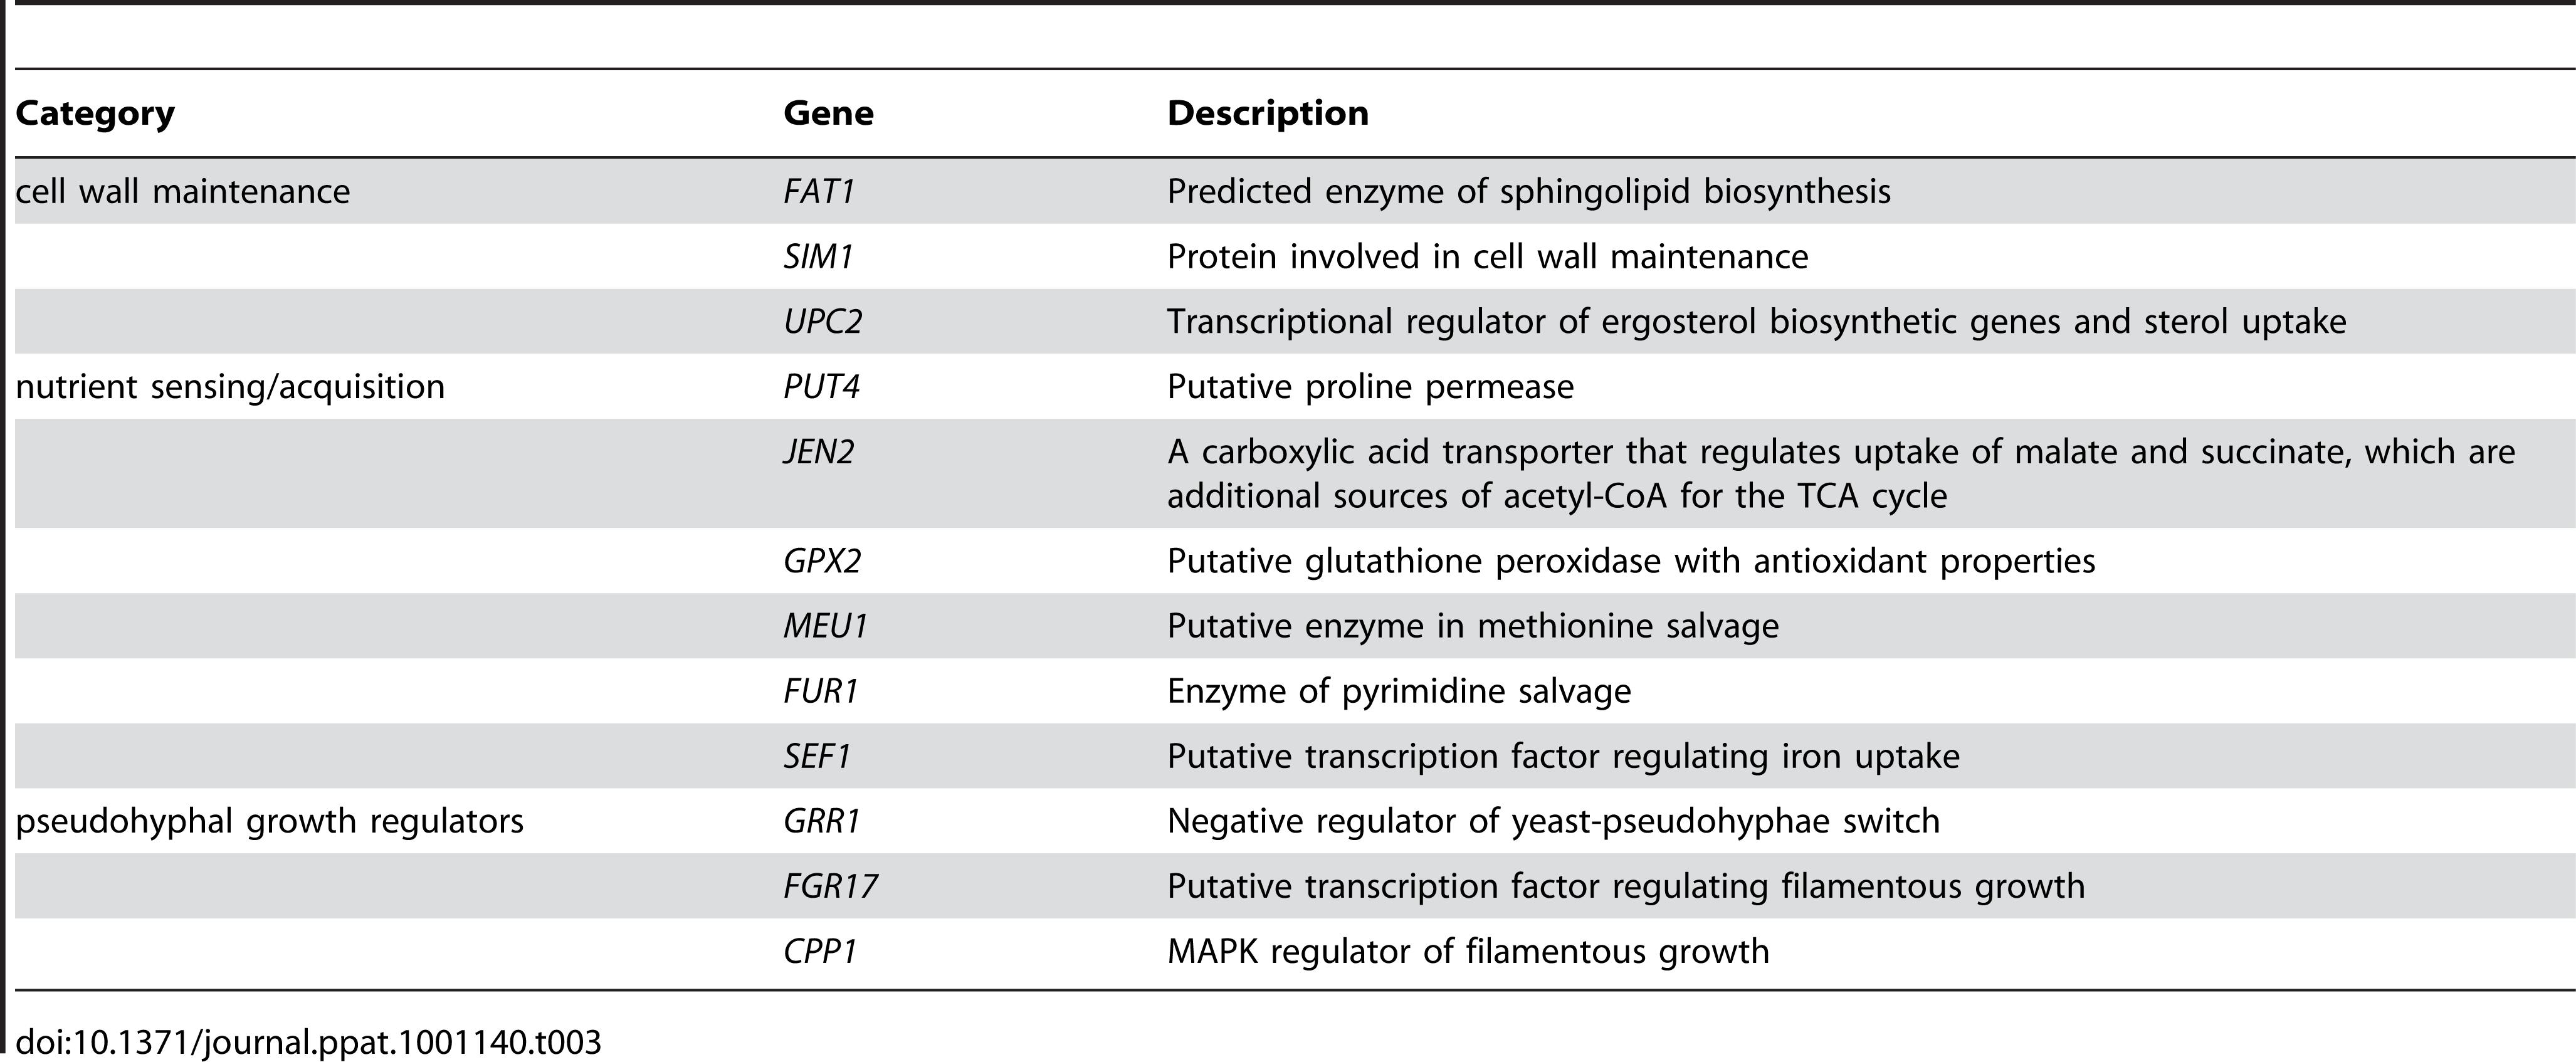 Categories of genes haploinsufficient in reduced-nutrient conditions.